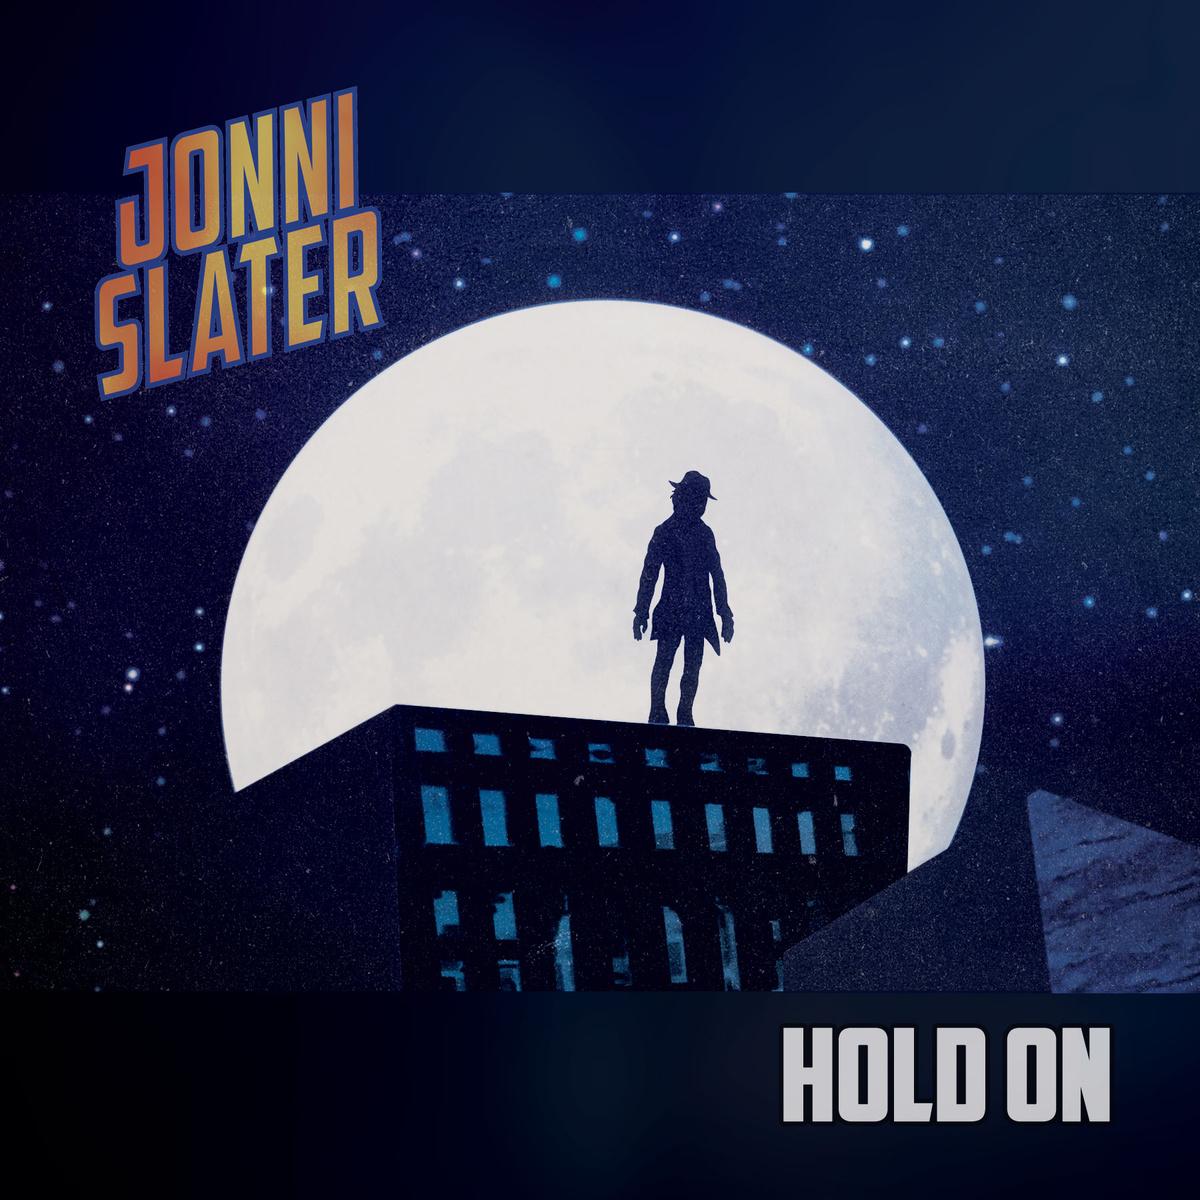 Jonni Slater – Hold On